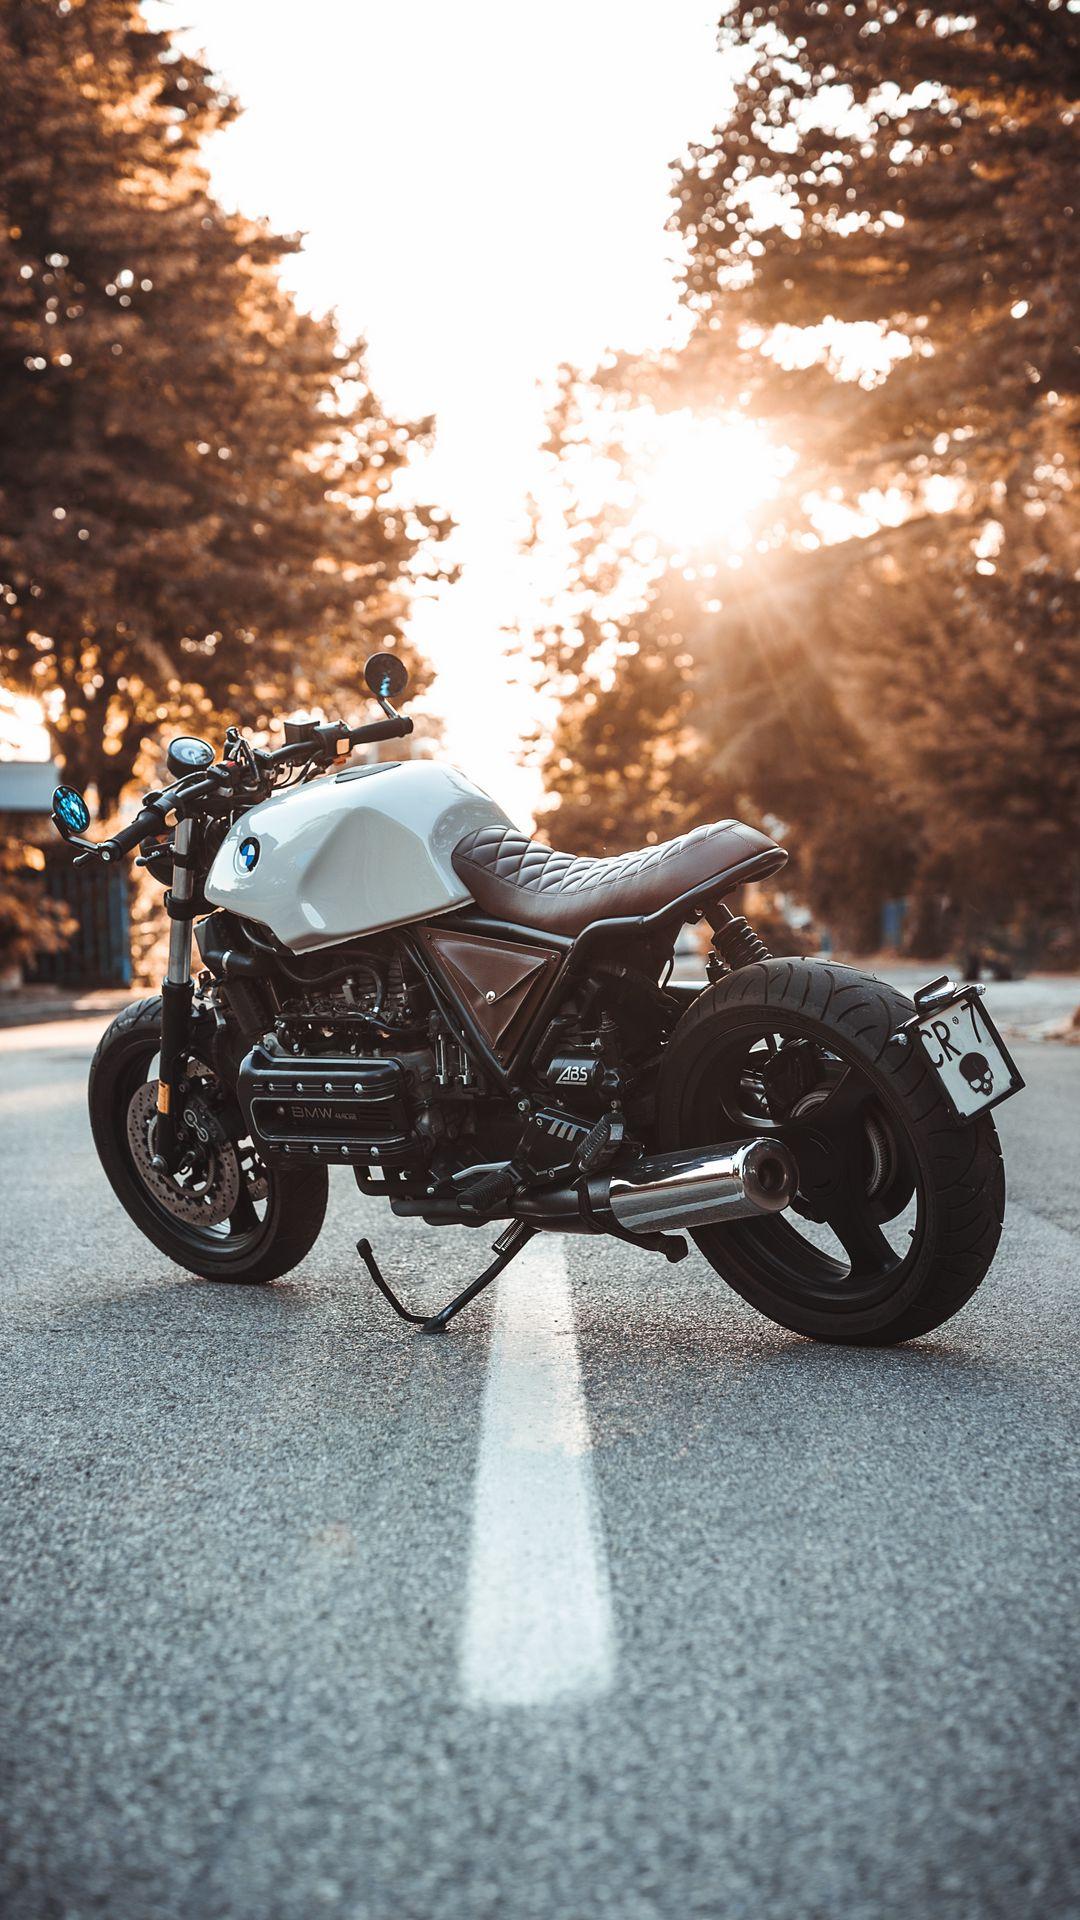 1080x1920 Обои bmw k100, мотоцикл, байк, вид сбоку